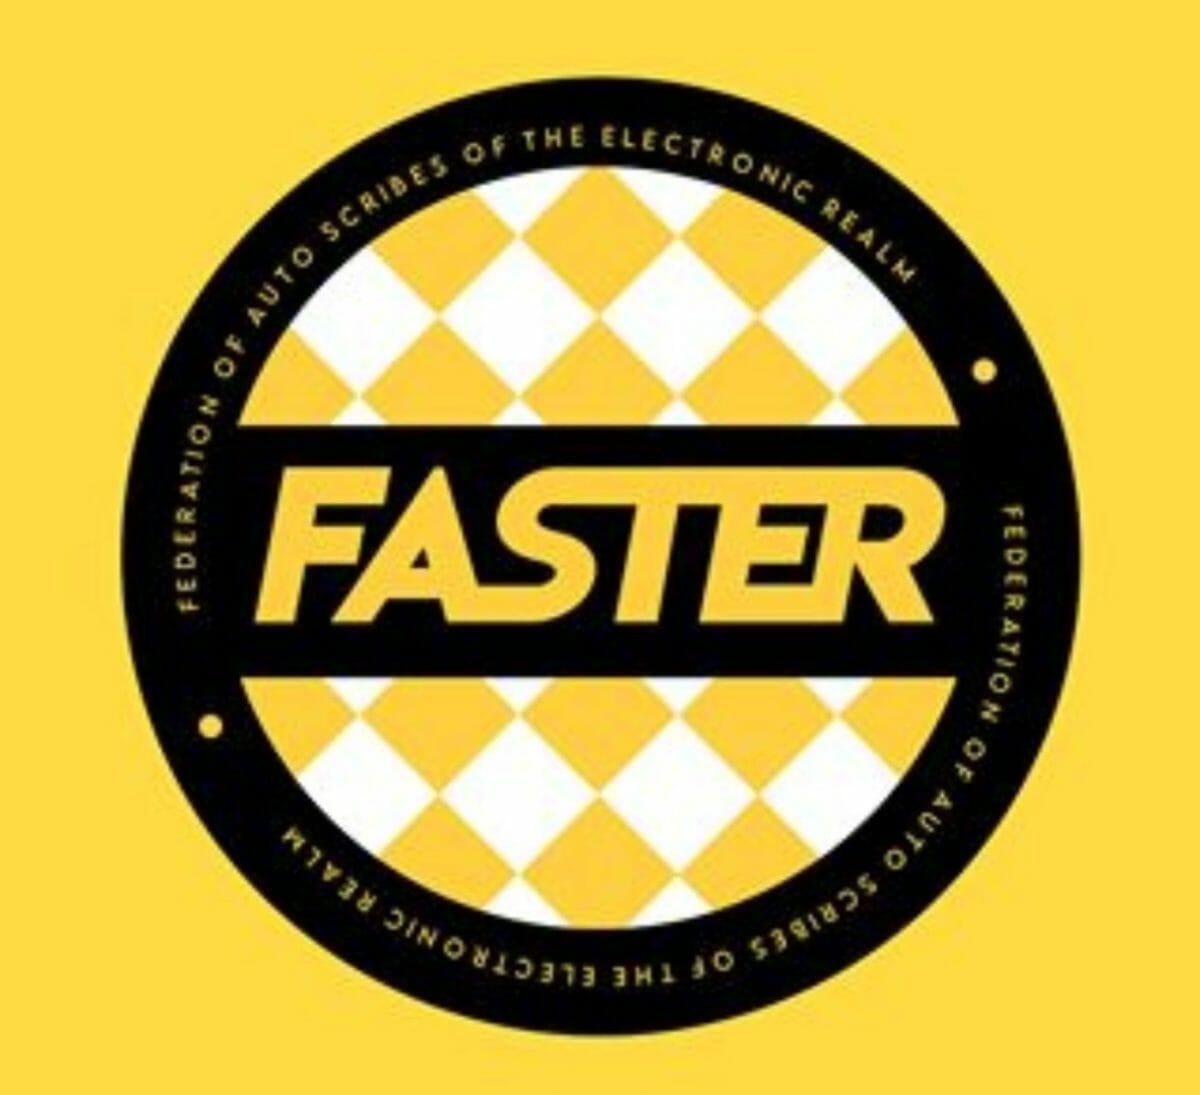 Faster logo (1)